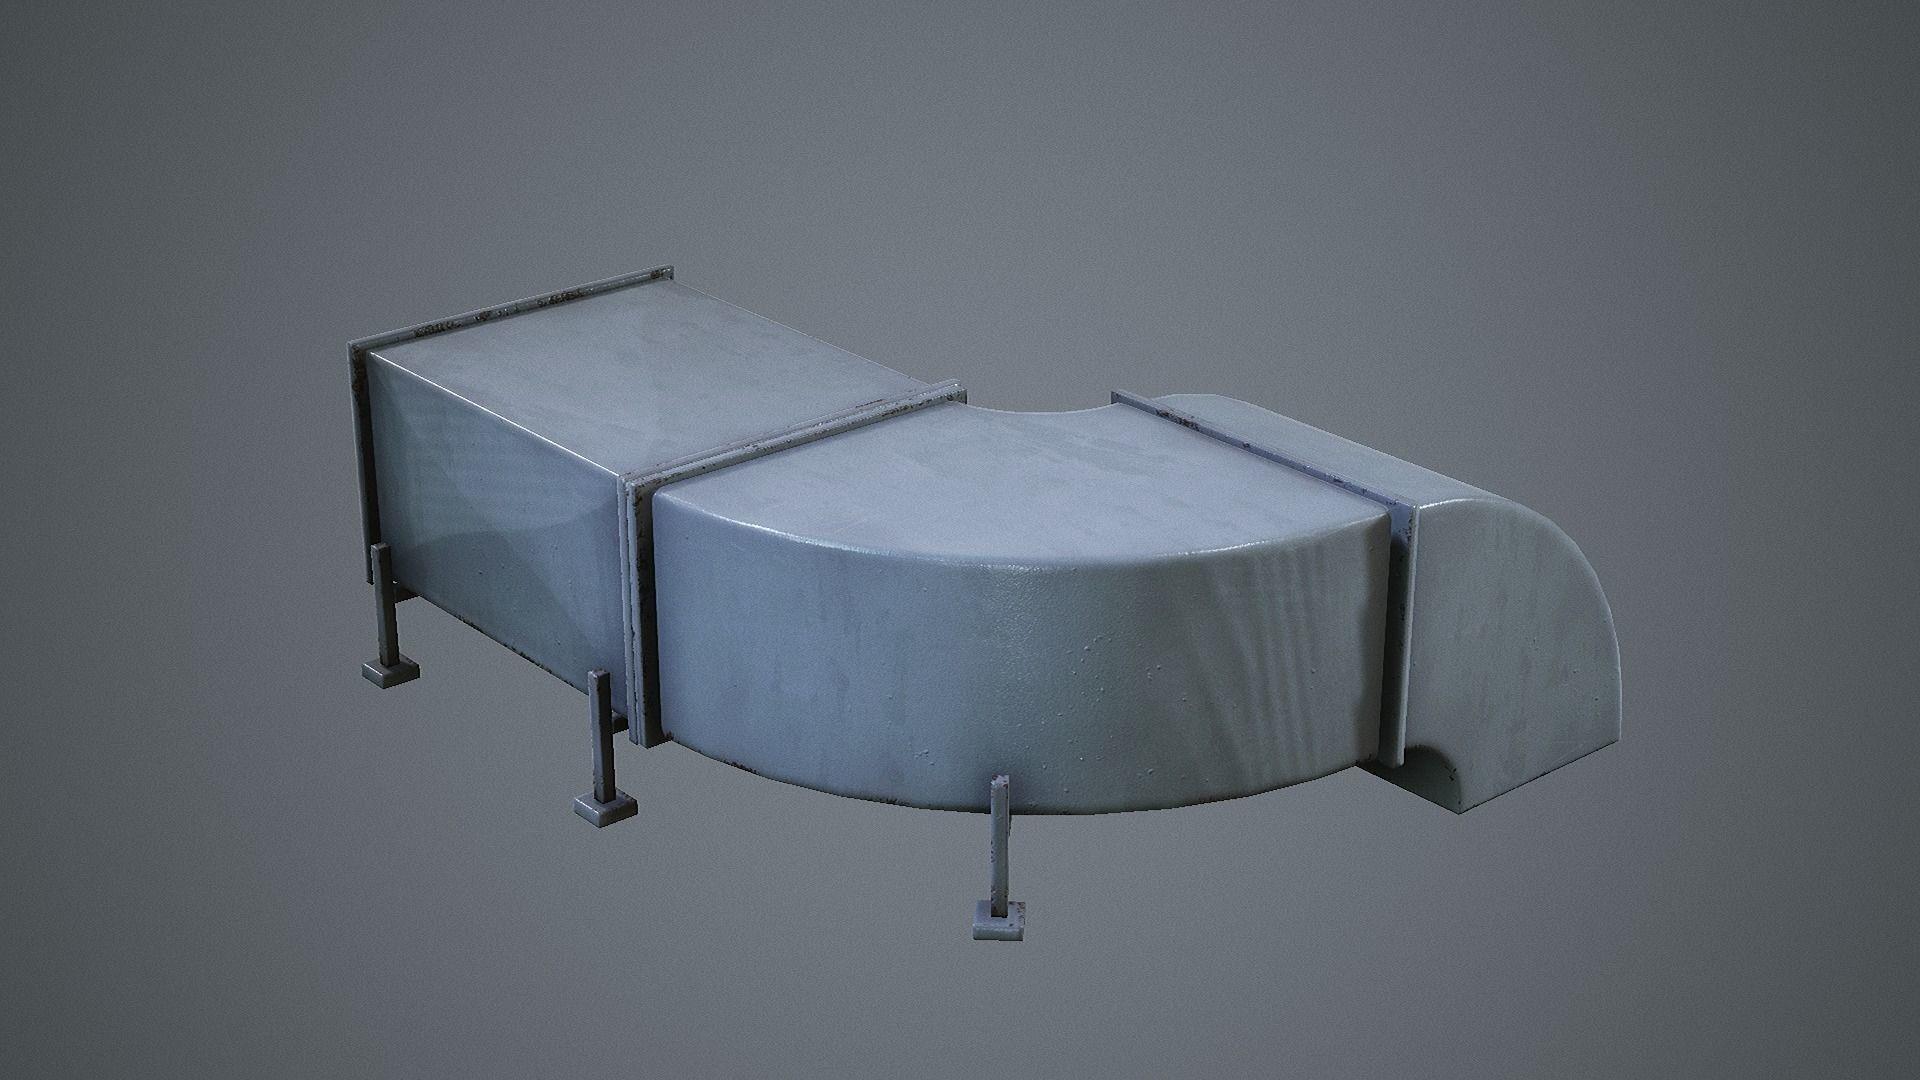 Air Conditioning Ducting HVAC Units